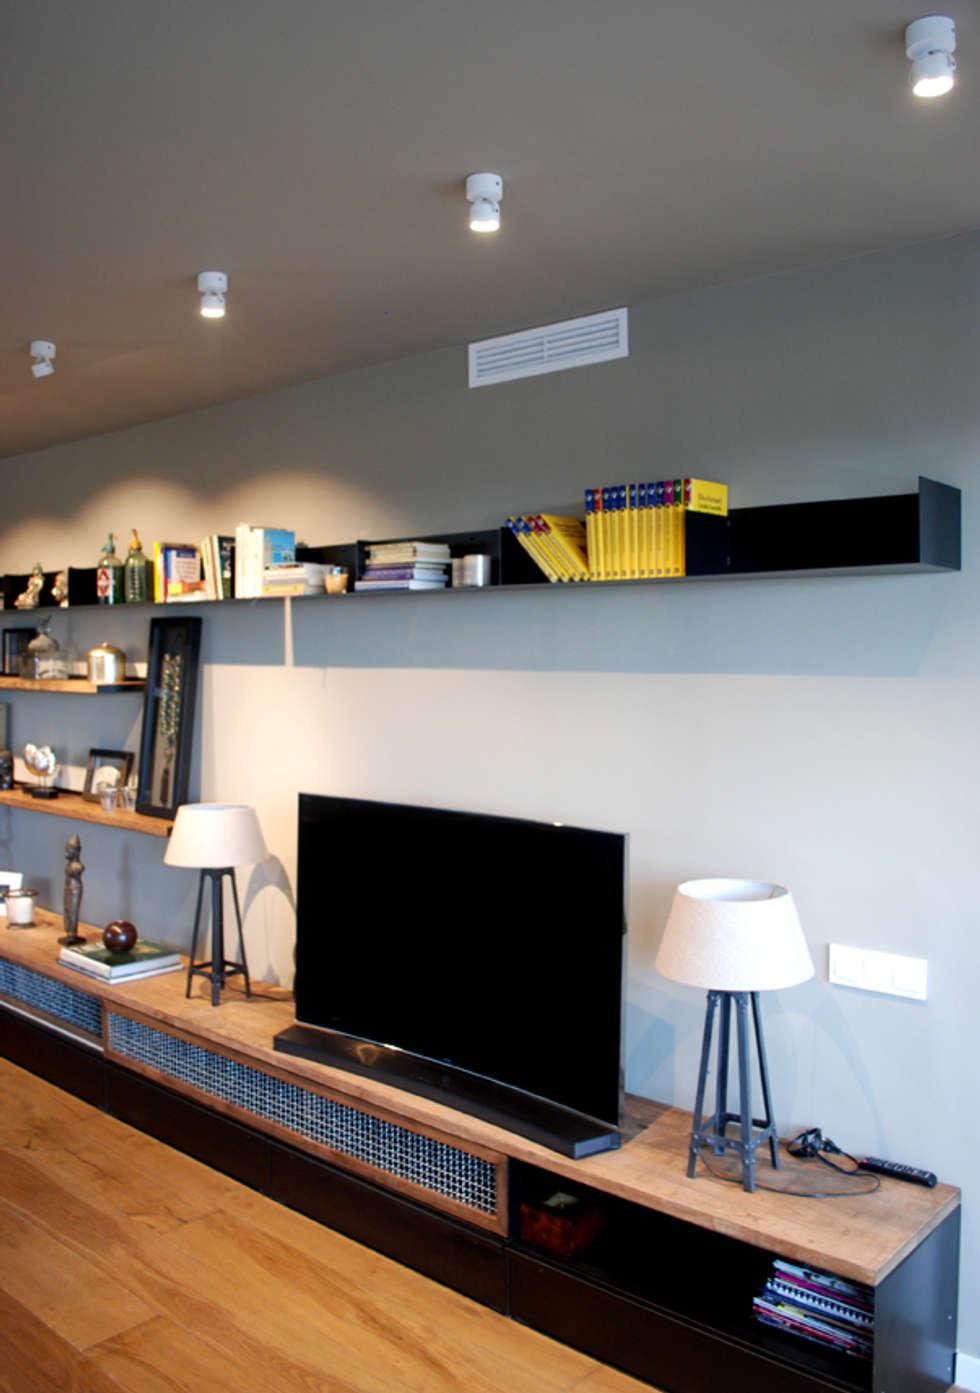 Fotos de decoraci n y dise o de interiores homify - Iluminacion led salon ...